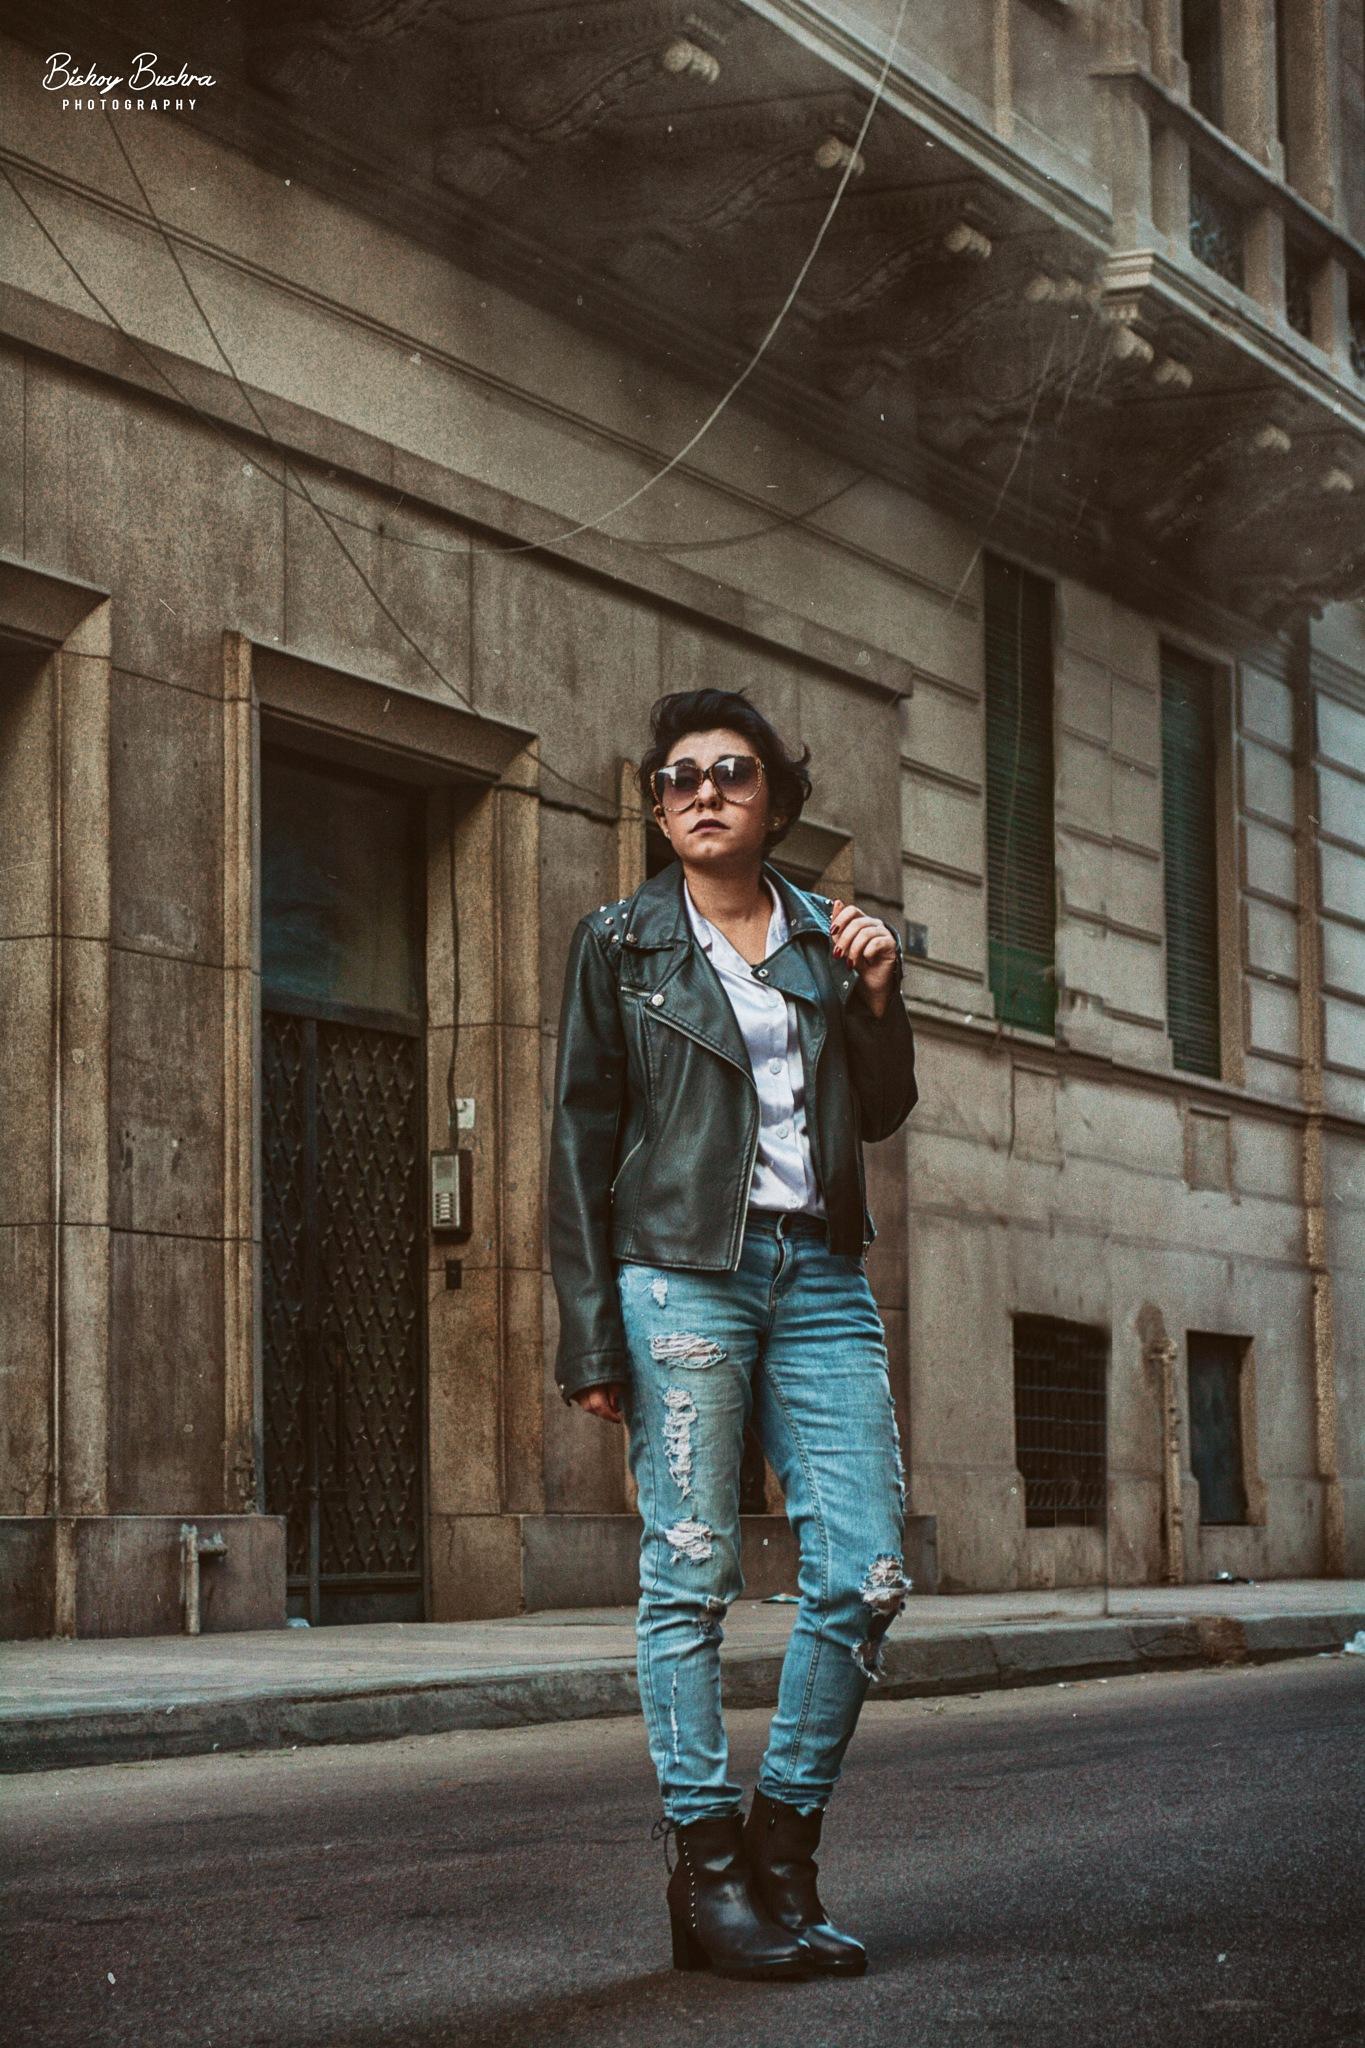 urban photoshoot by Bishoy Bushra